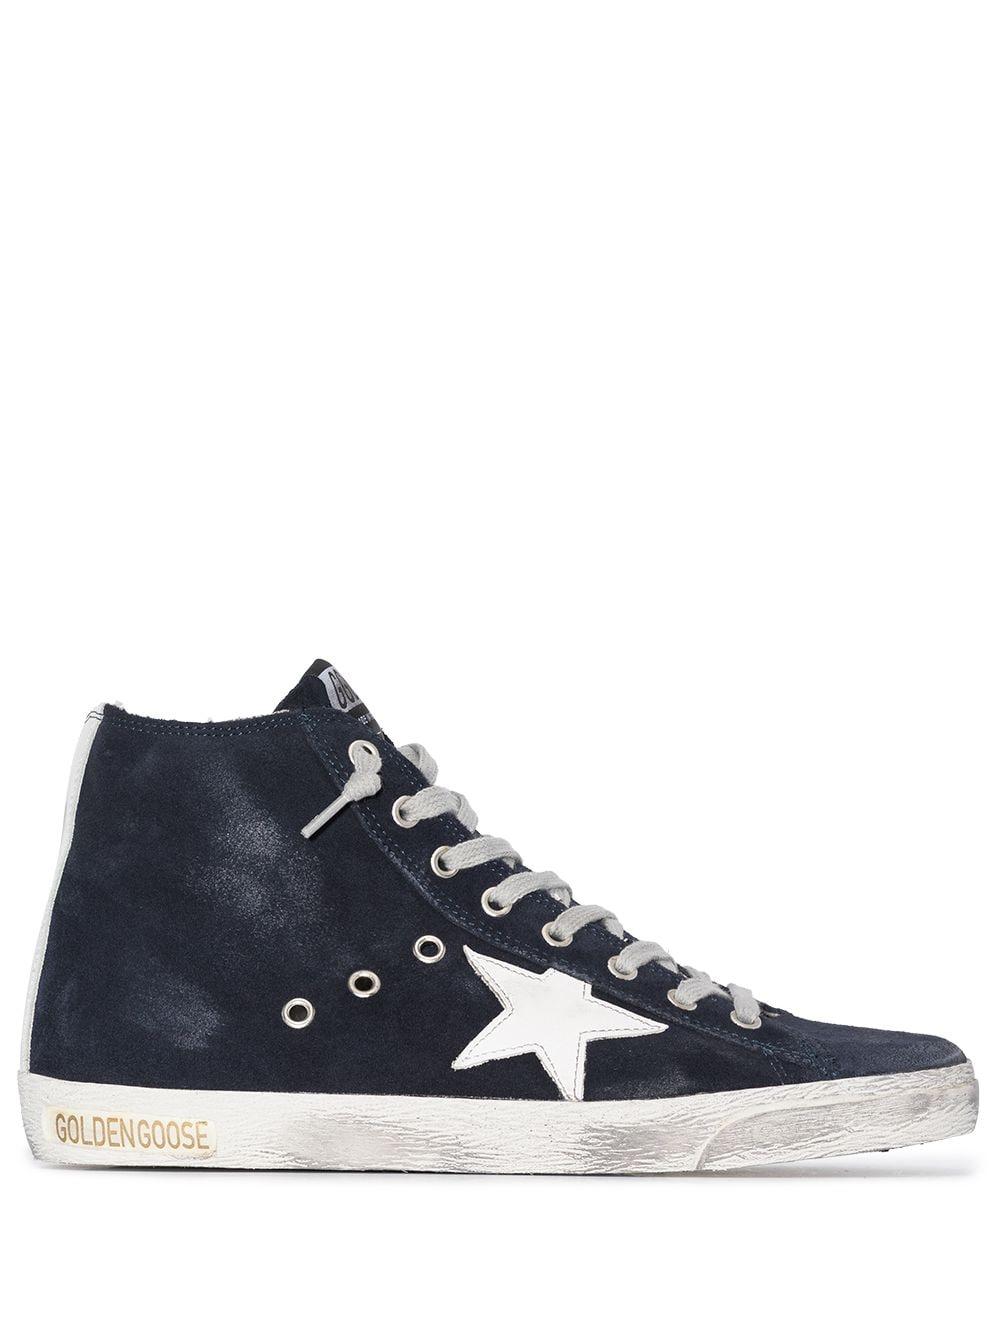 Picture of Golden Goose Deluxe Brand   Francy Suede High-Top Sneakers